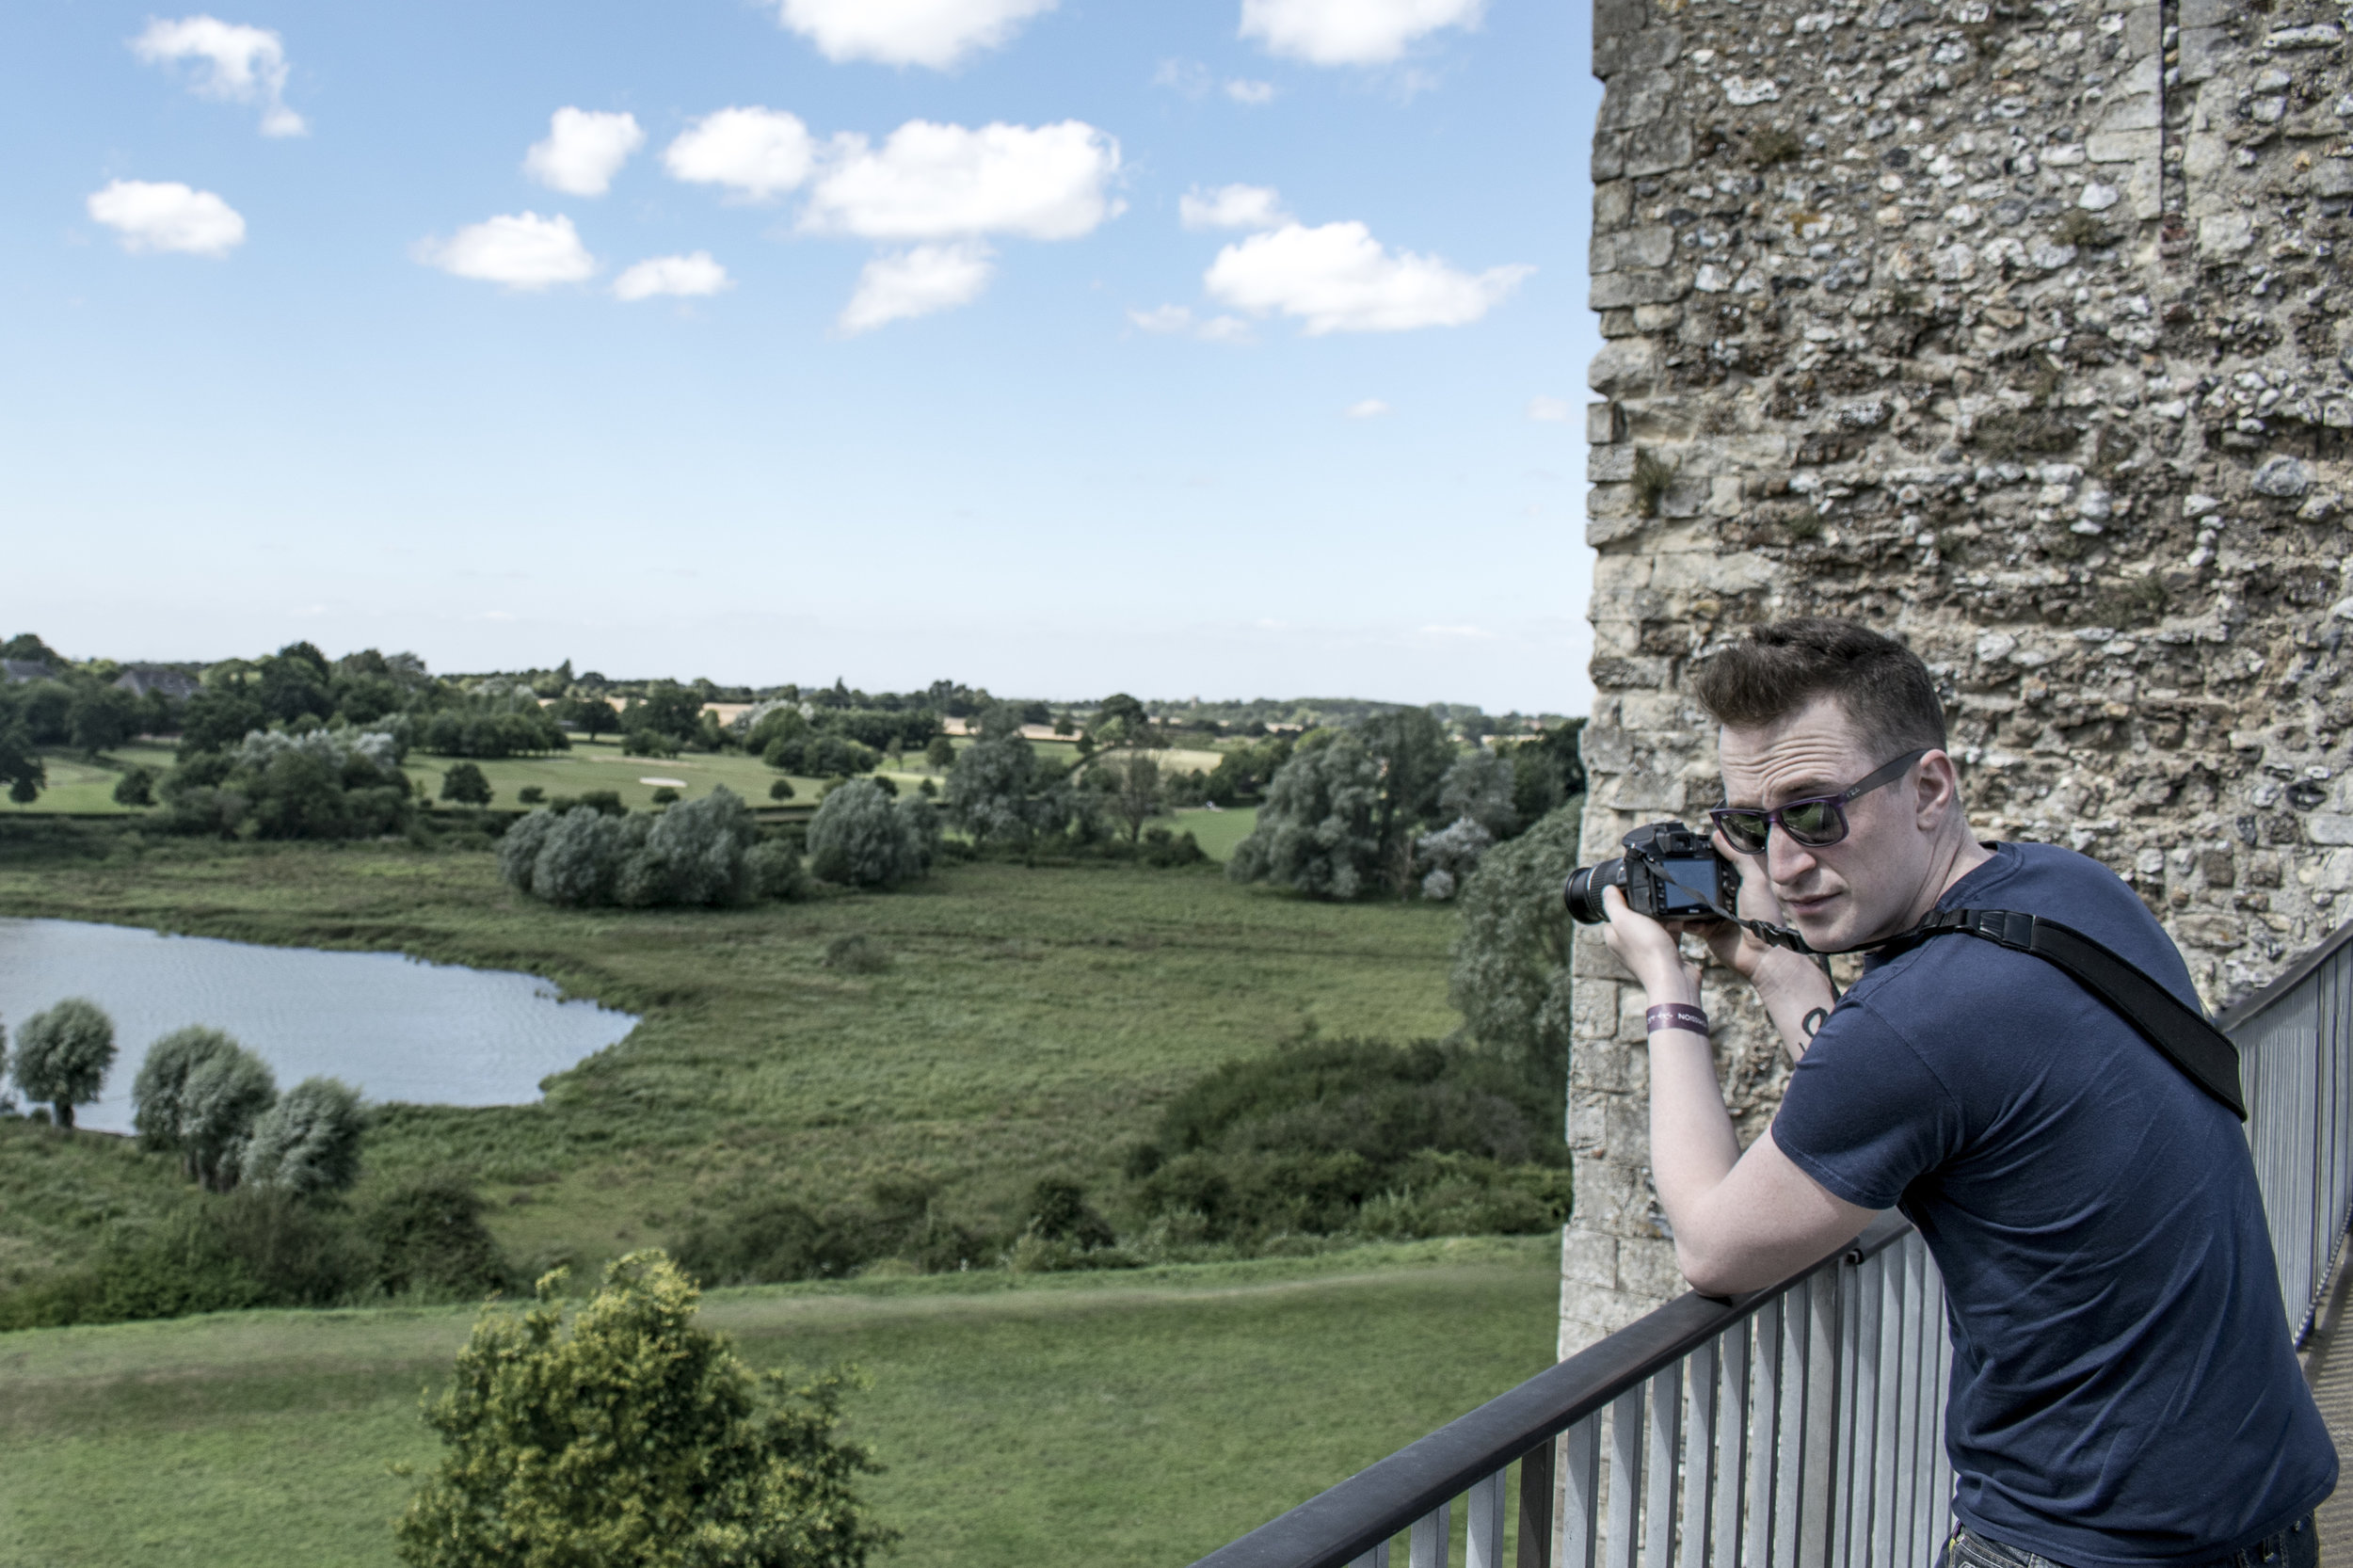 Alec Suttenwood - Photographer, Content Creator and General Smart-Alec